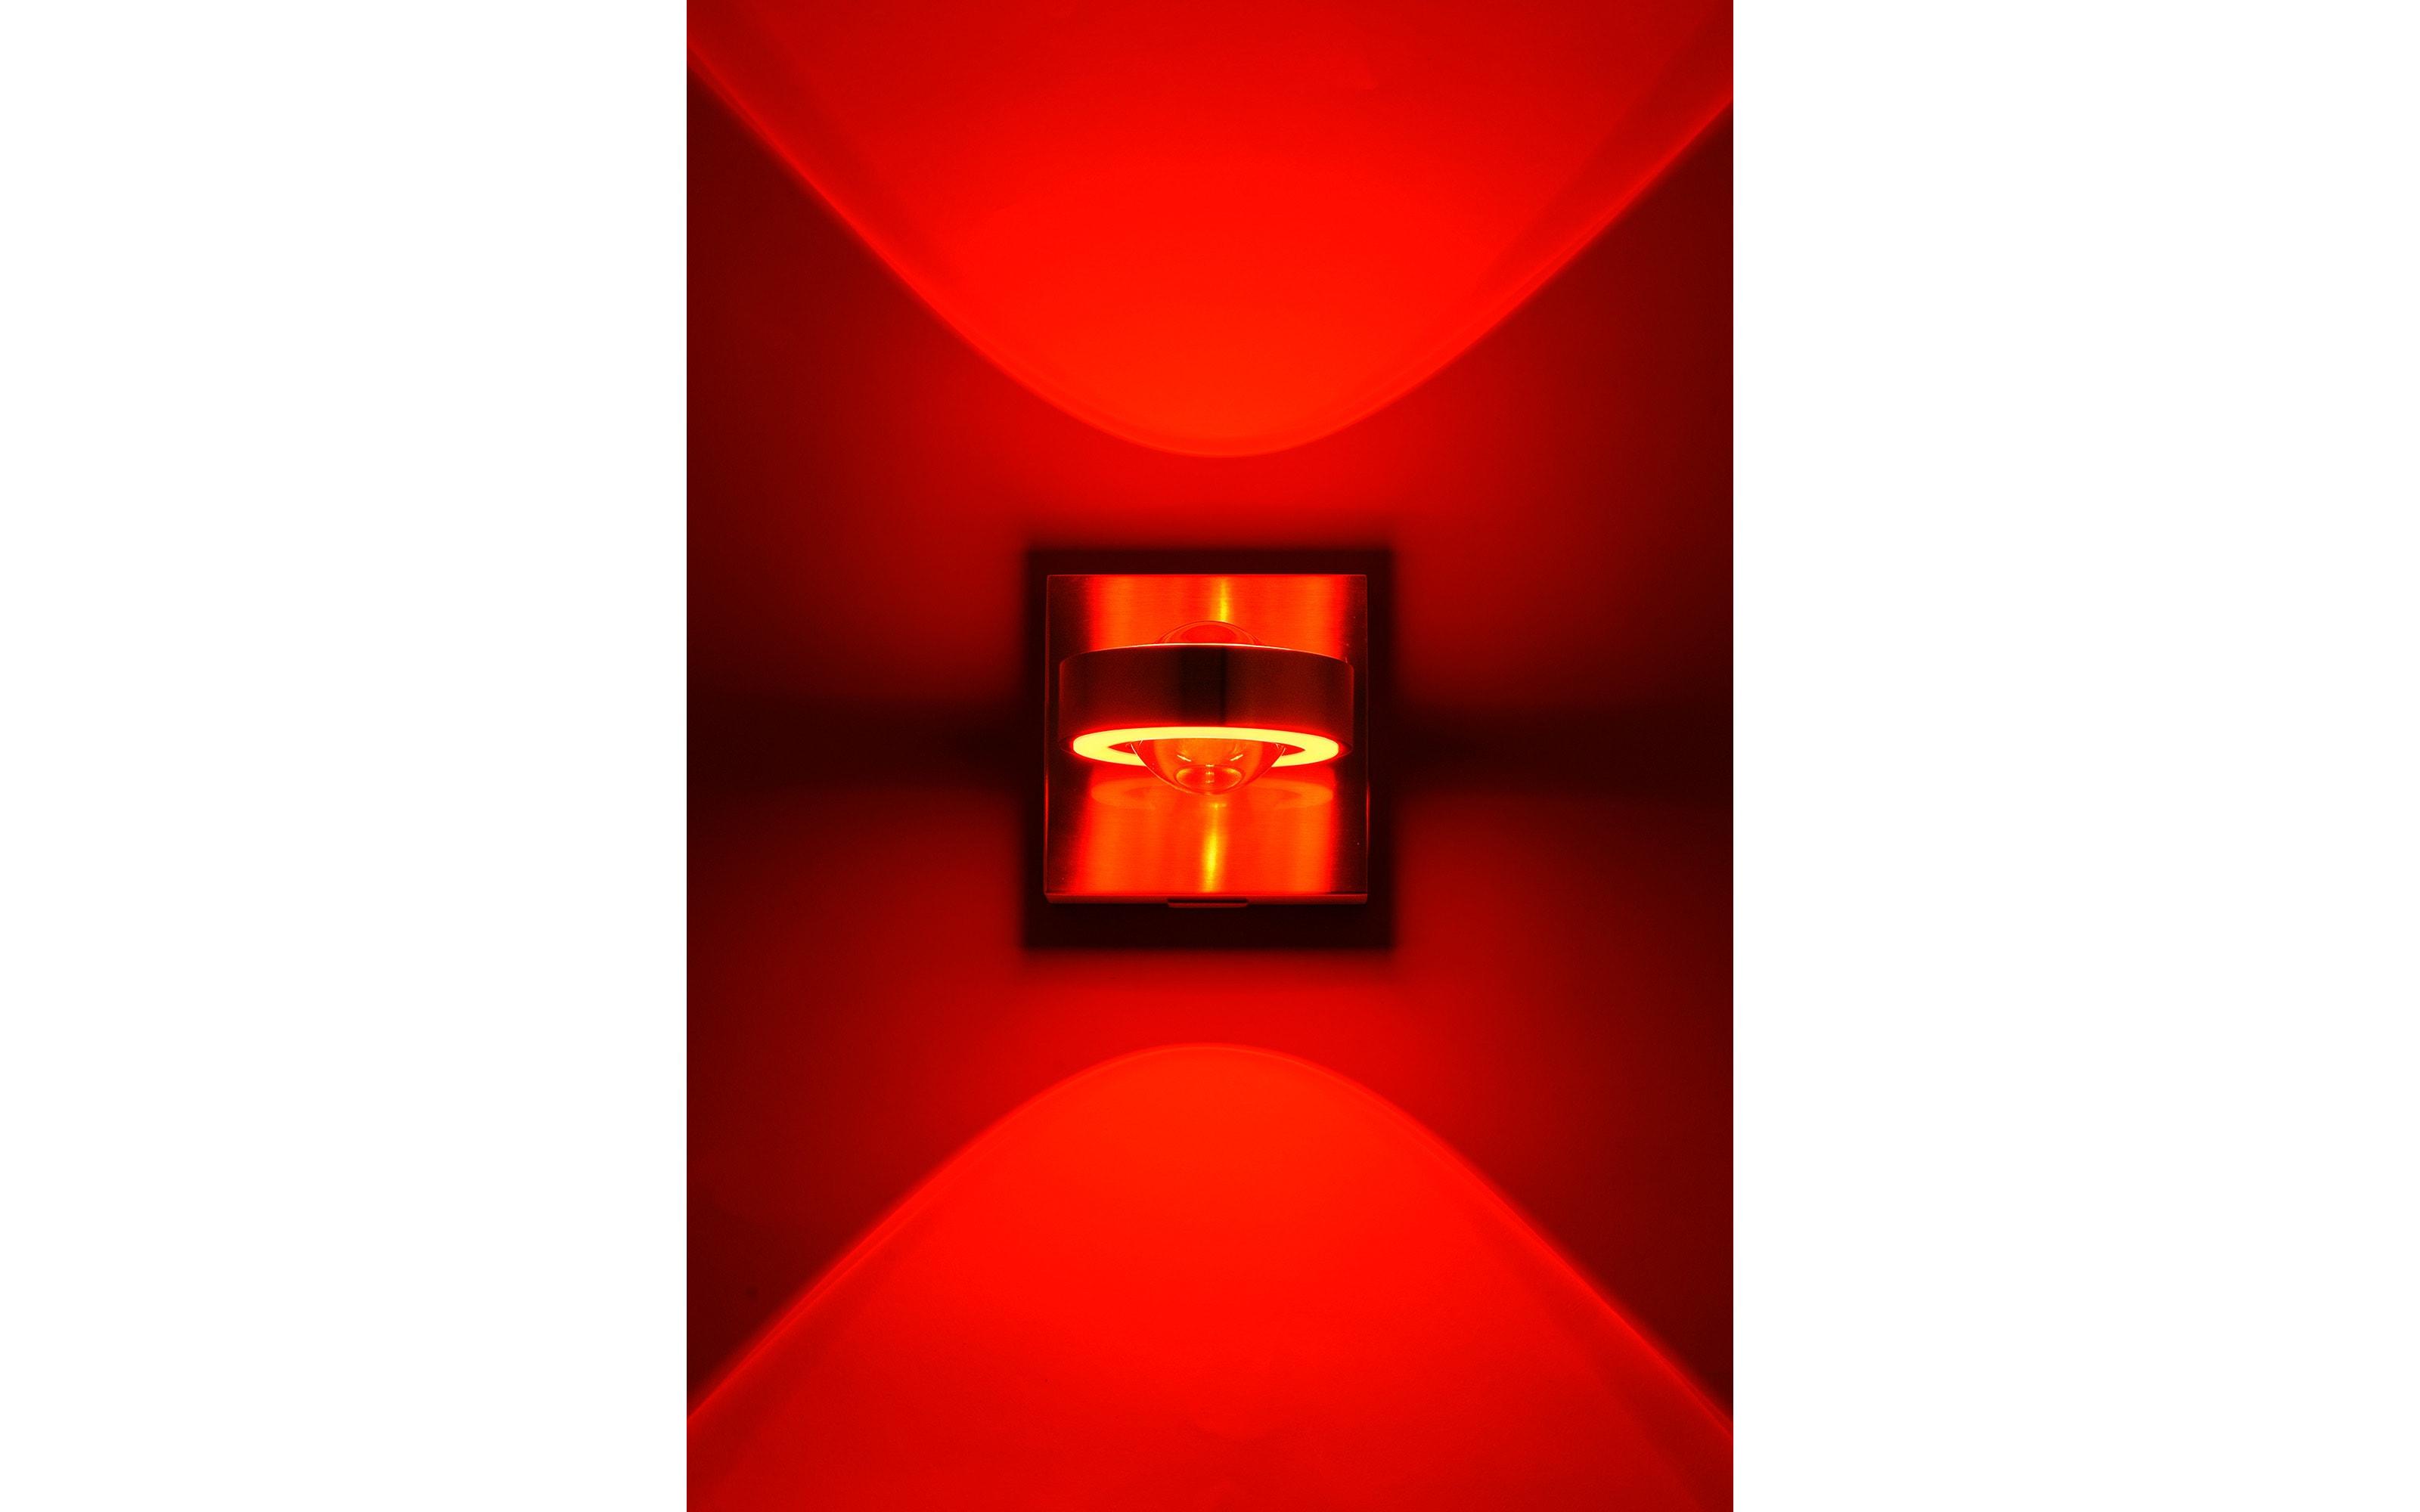 LED-Wandleuchte RGB CCT Q-Mia in stahlfarbig